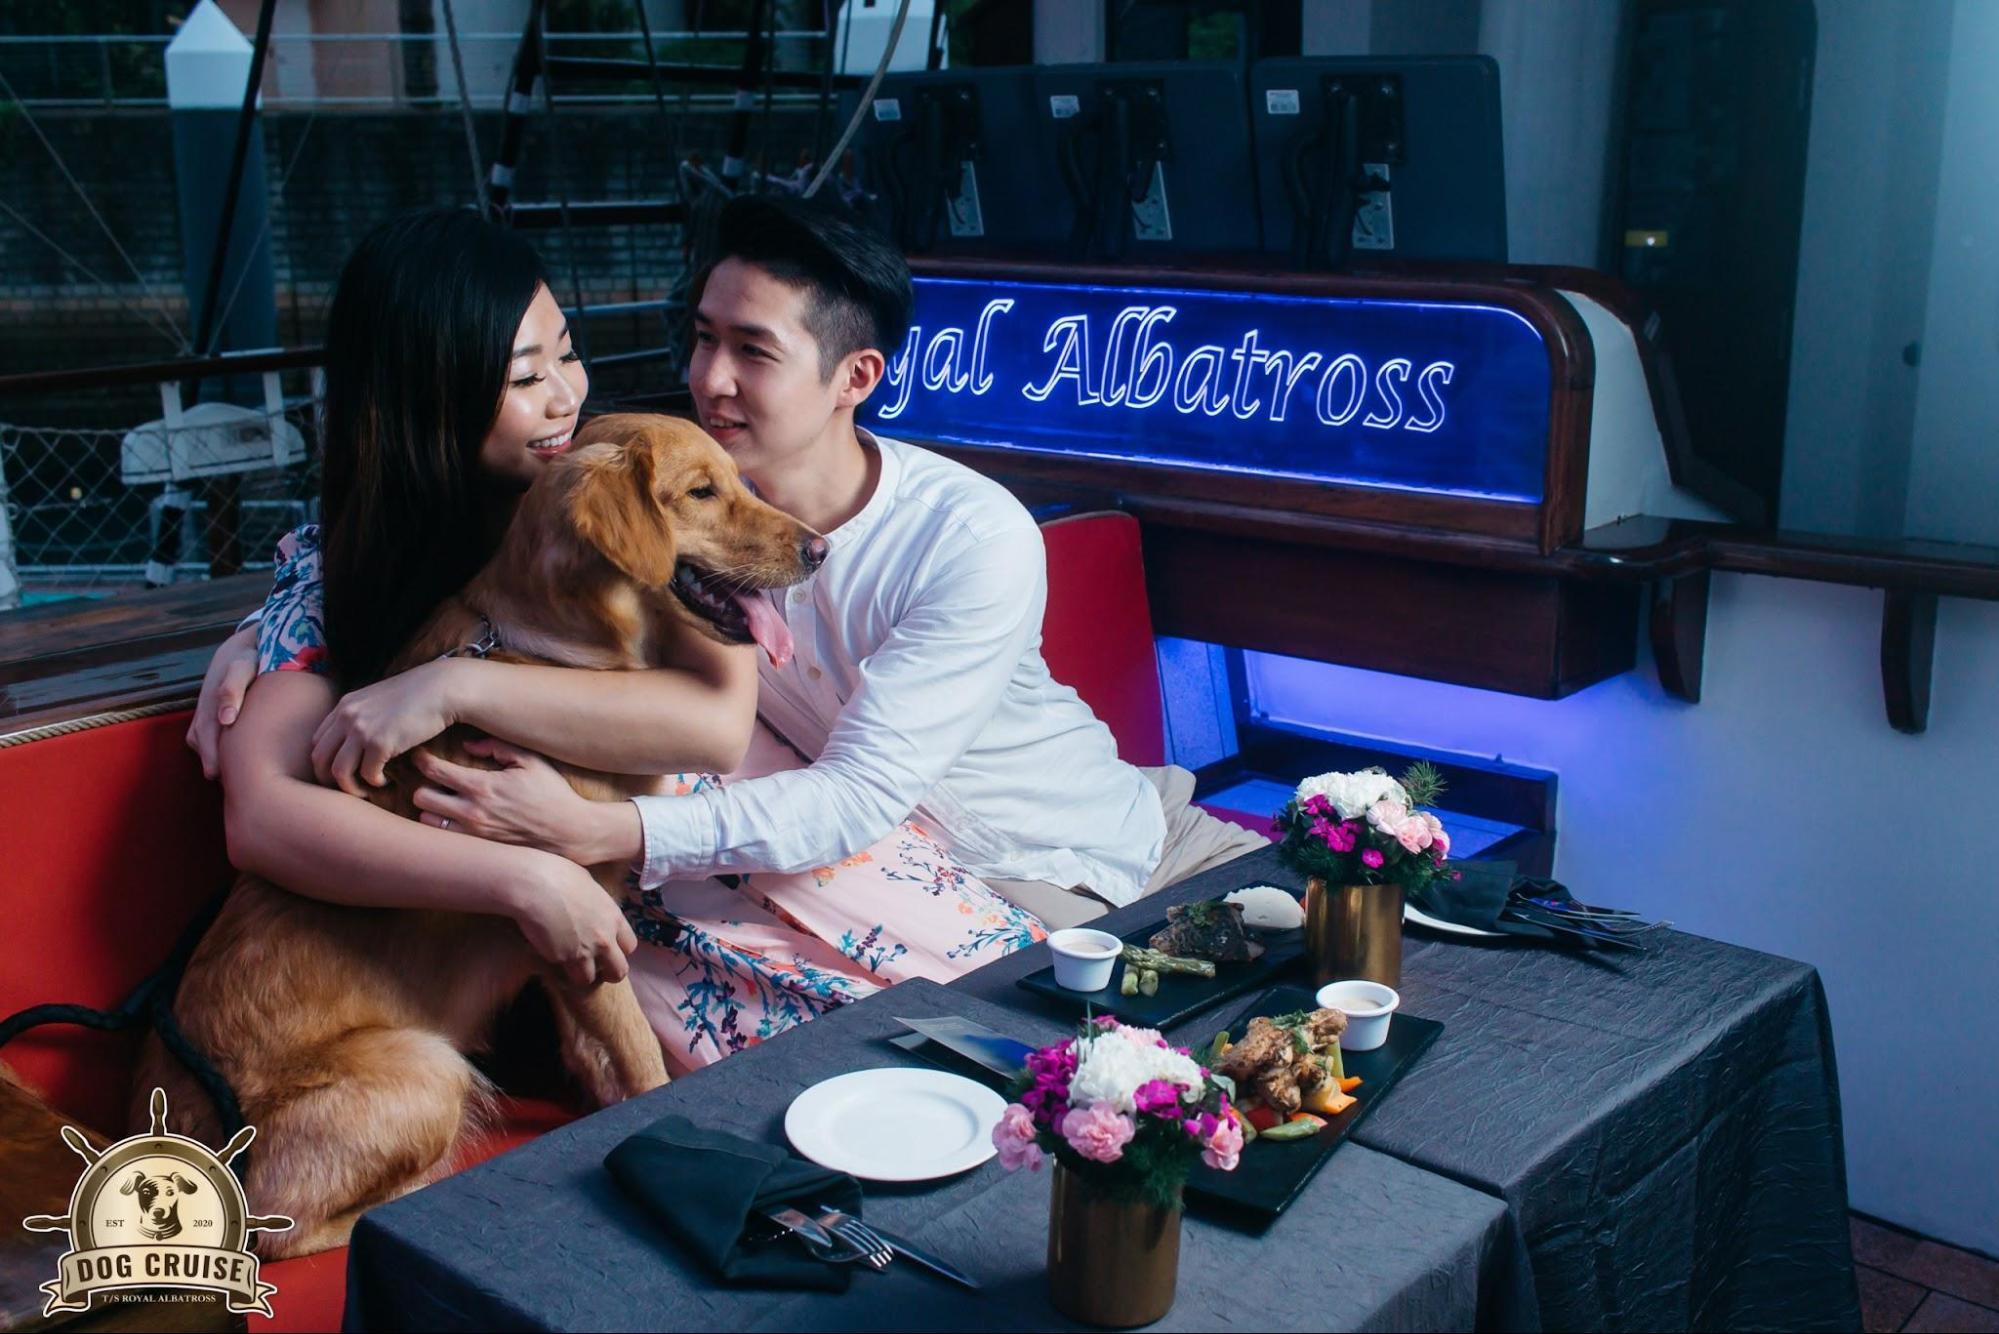 luxury activities singapore - royal albatross dog cruise